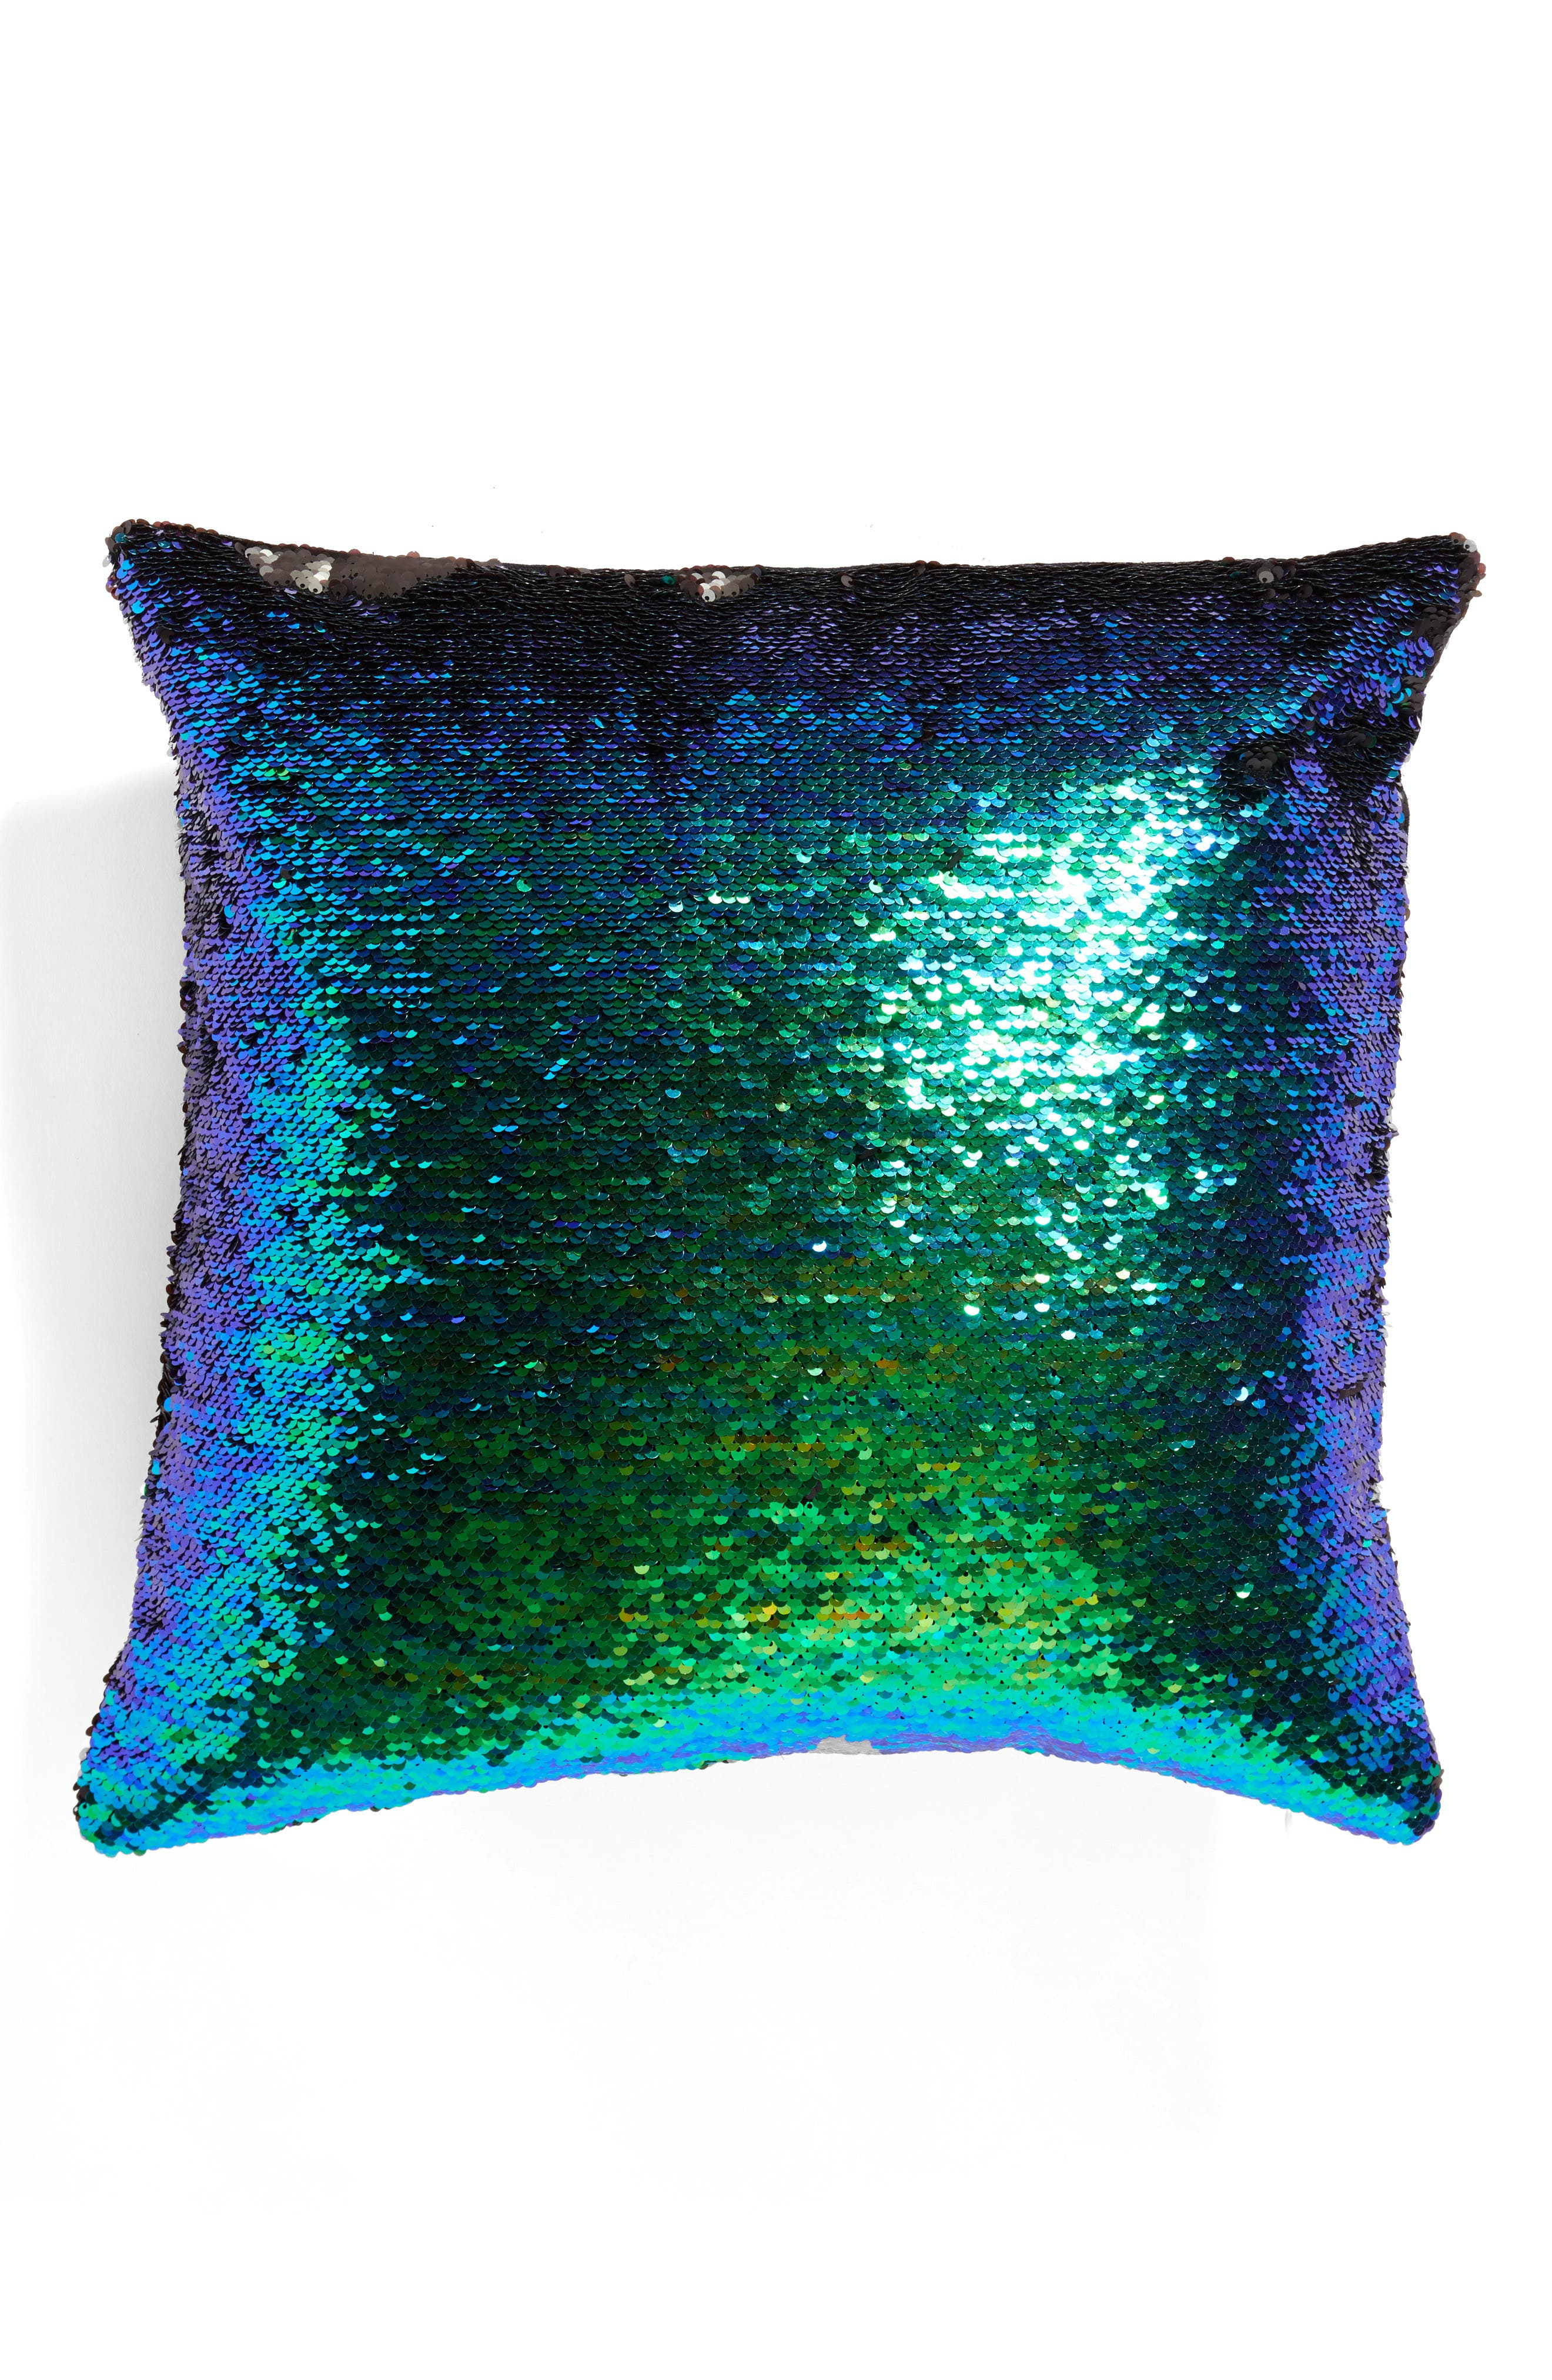 Sequin Pillow,                             Main thumbnail 1, color,                             001